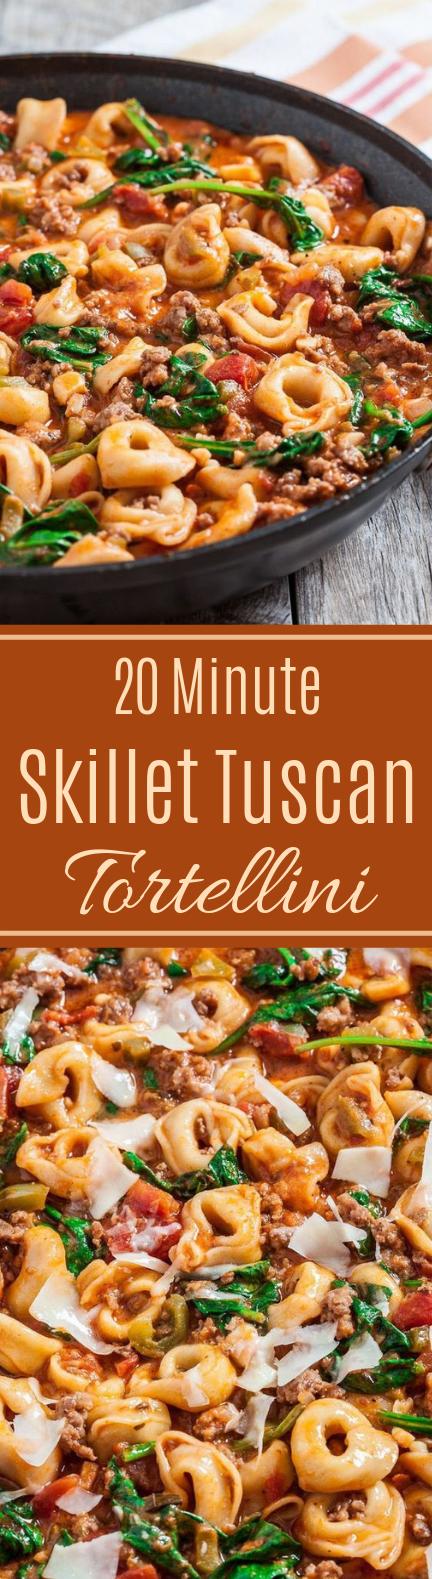 20-Minute Skillet Tuscan Tortellini #quick #dinner